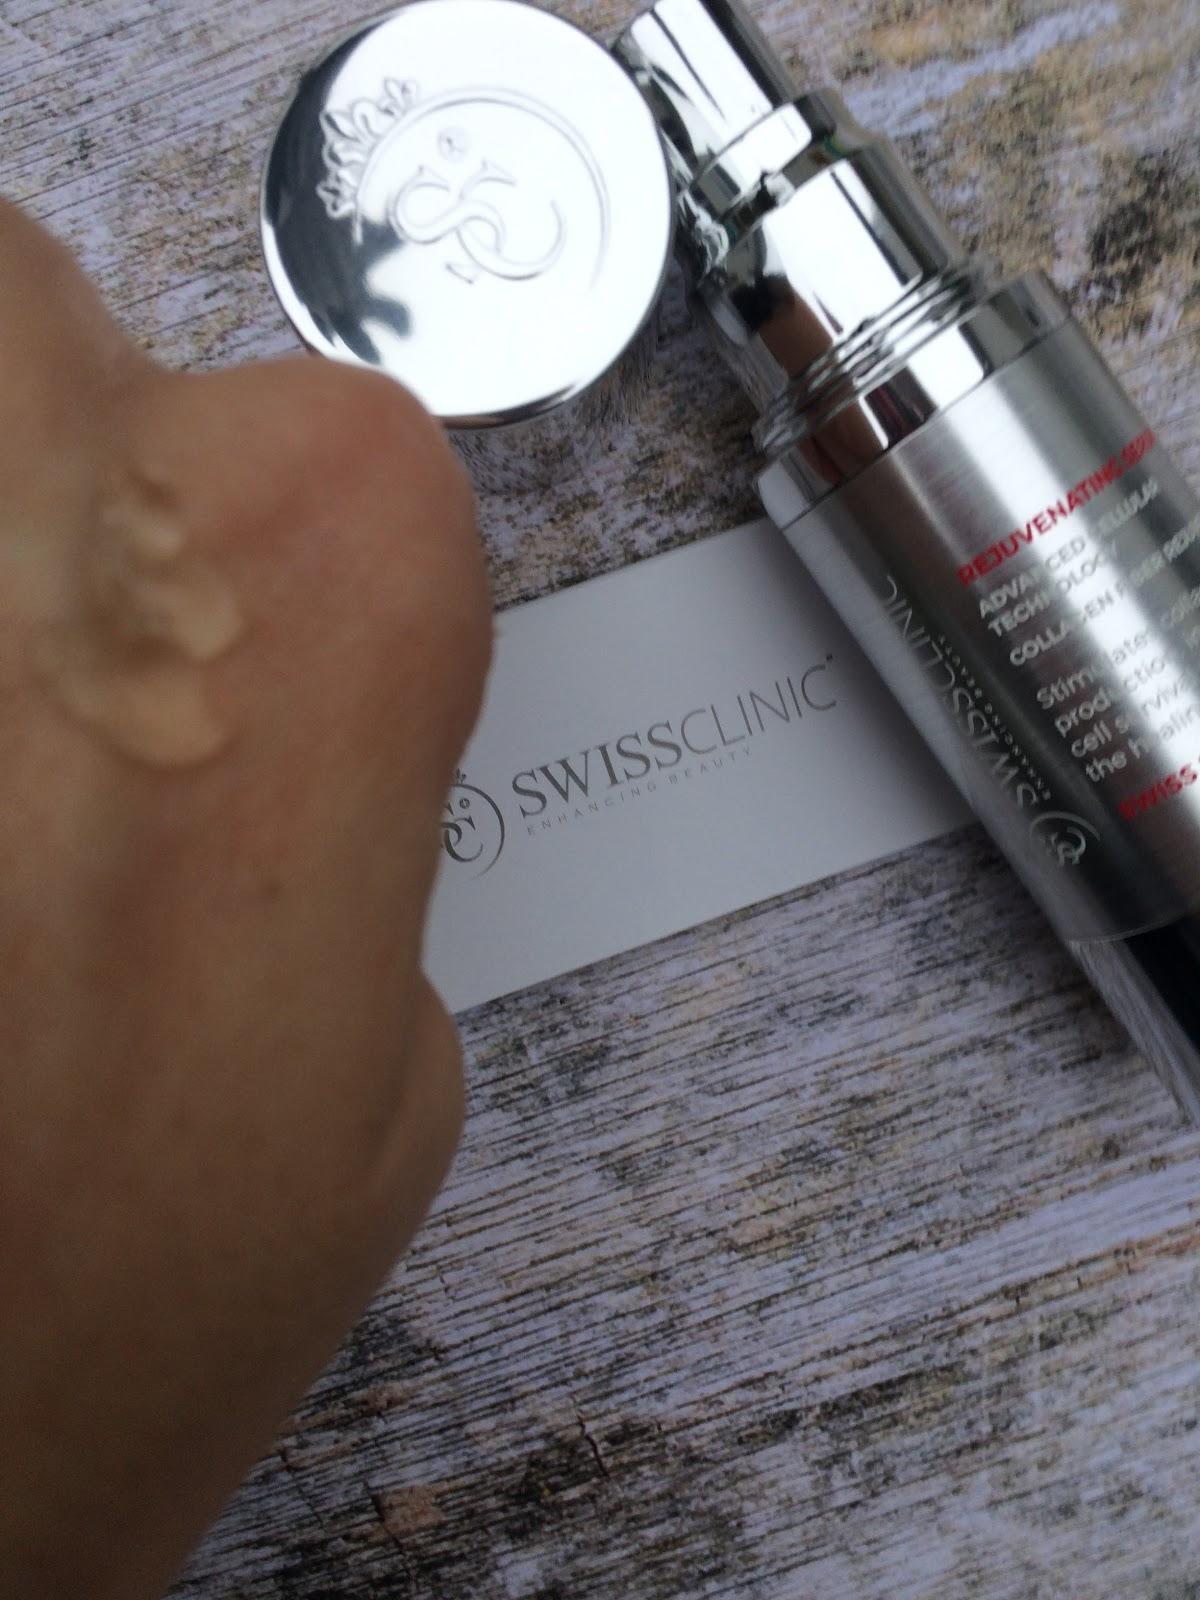 SwissClinic serum